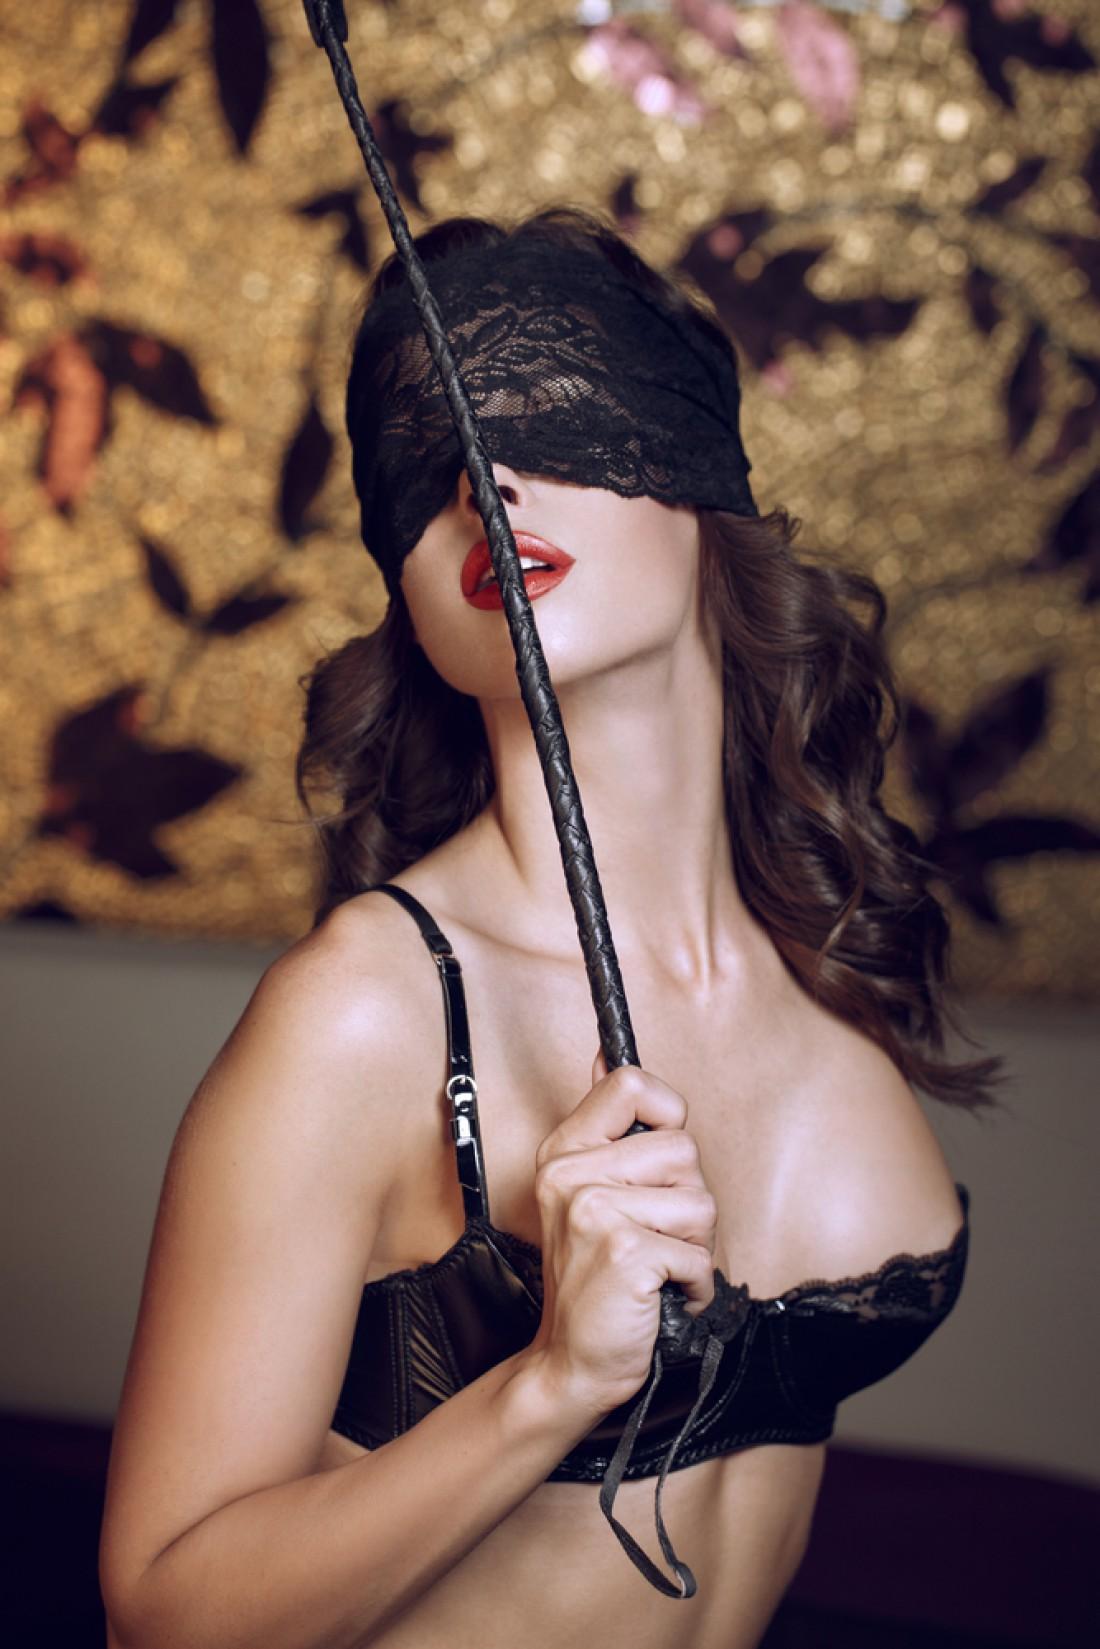 Back black in lingerie